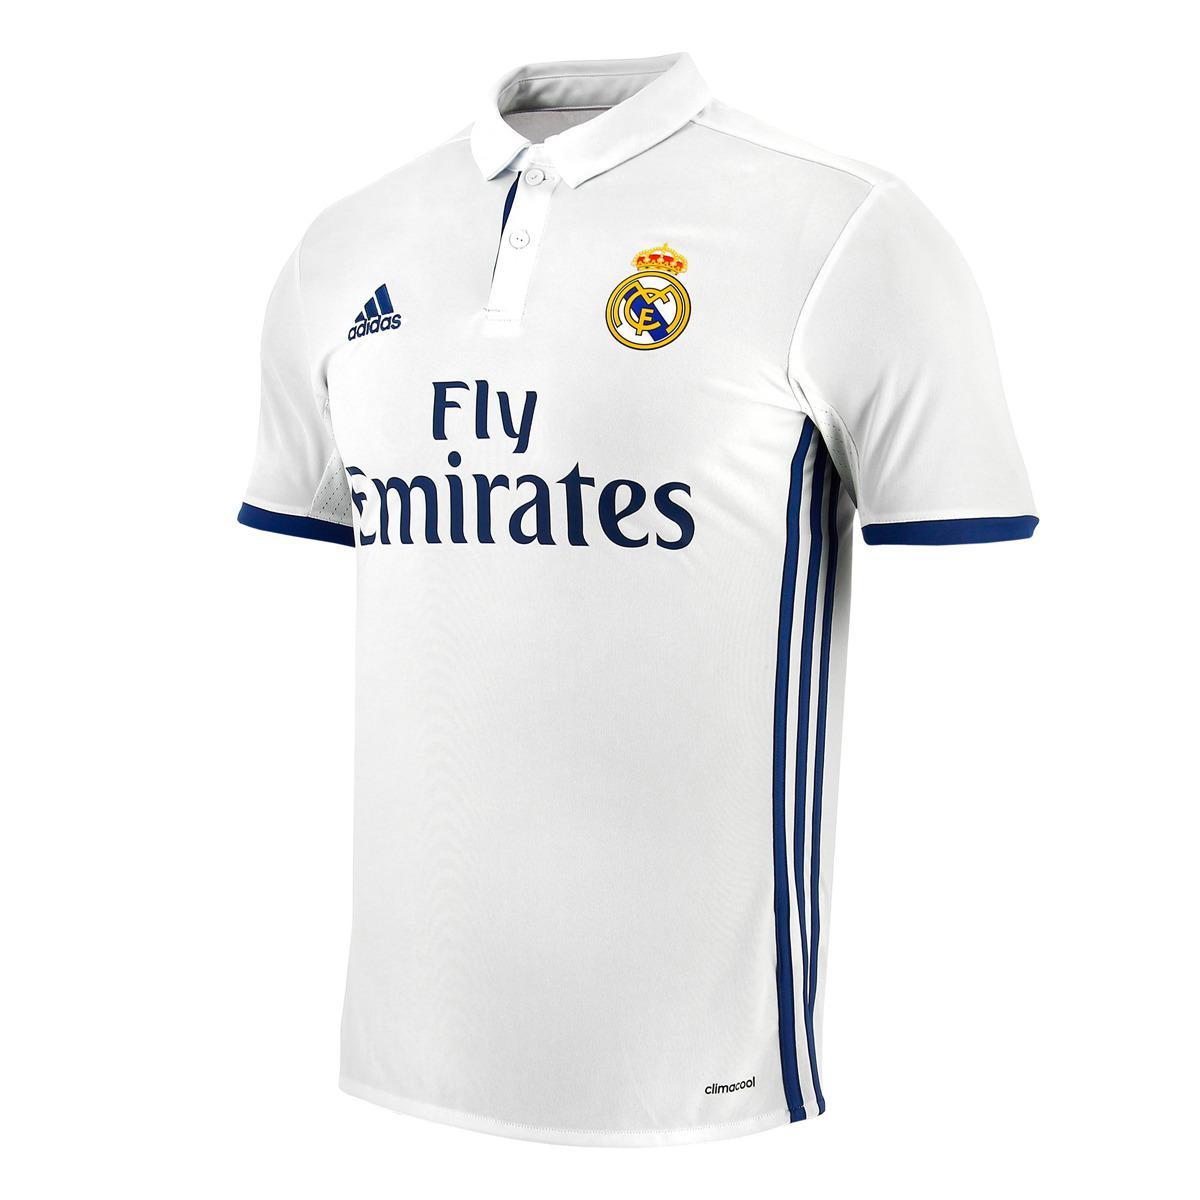 e2adfbdc7b8 adidas Originals Real Madrid Cf Uefa Champions League 2016-2017 Bale ...